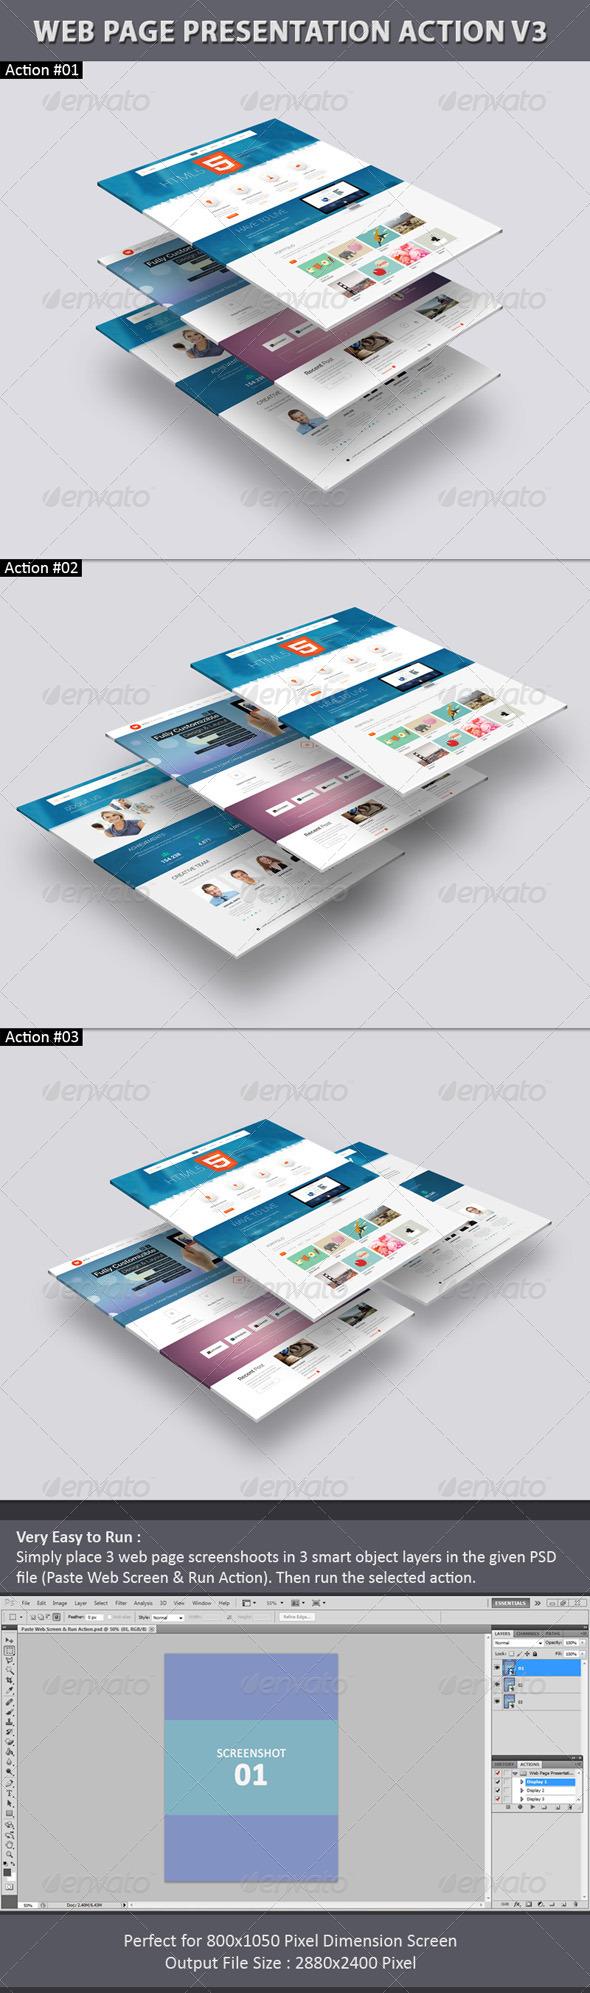 GraphicRiver Web Page Presentation Action V3 7576219